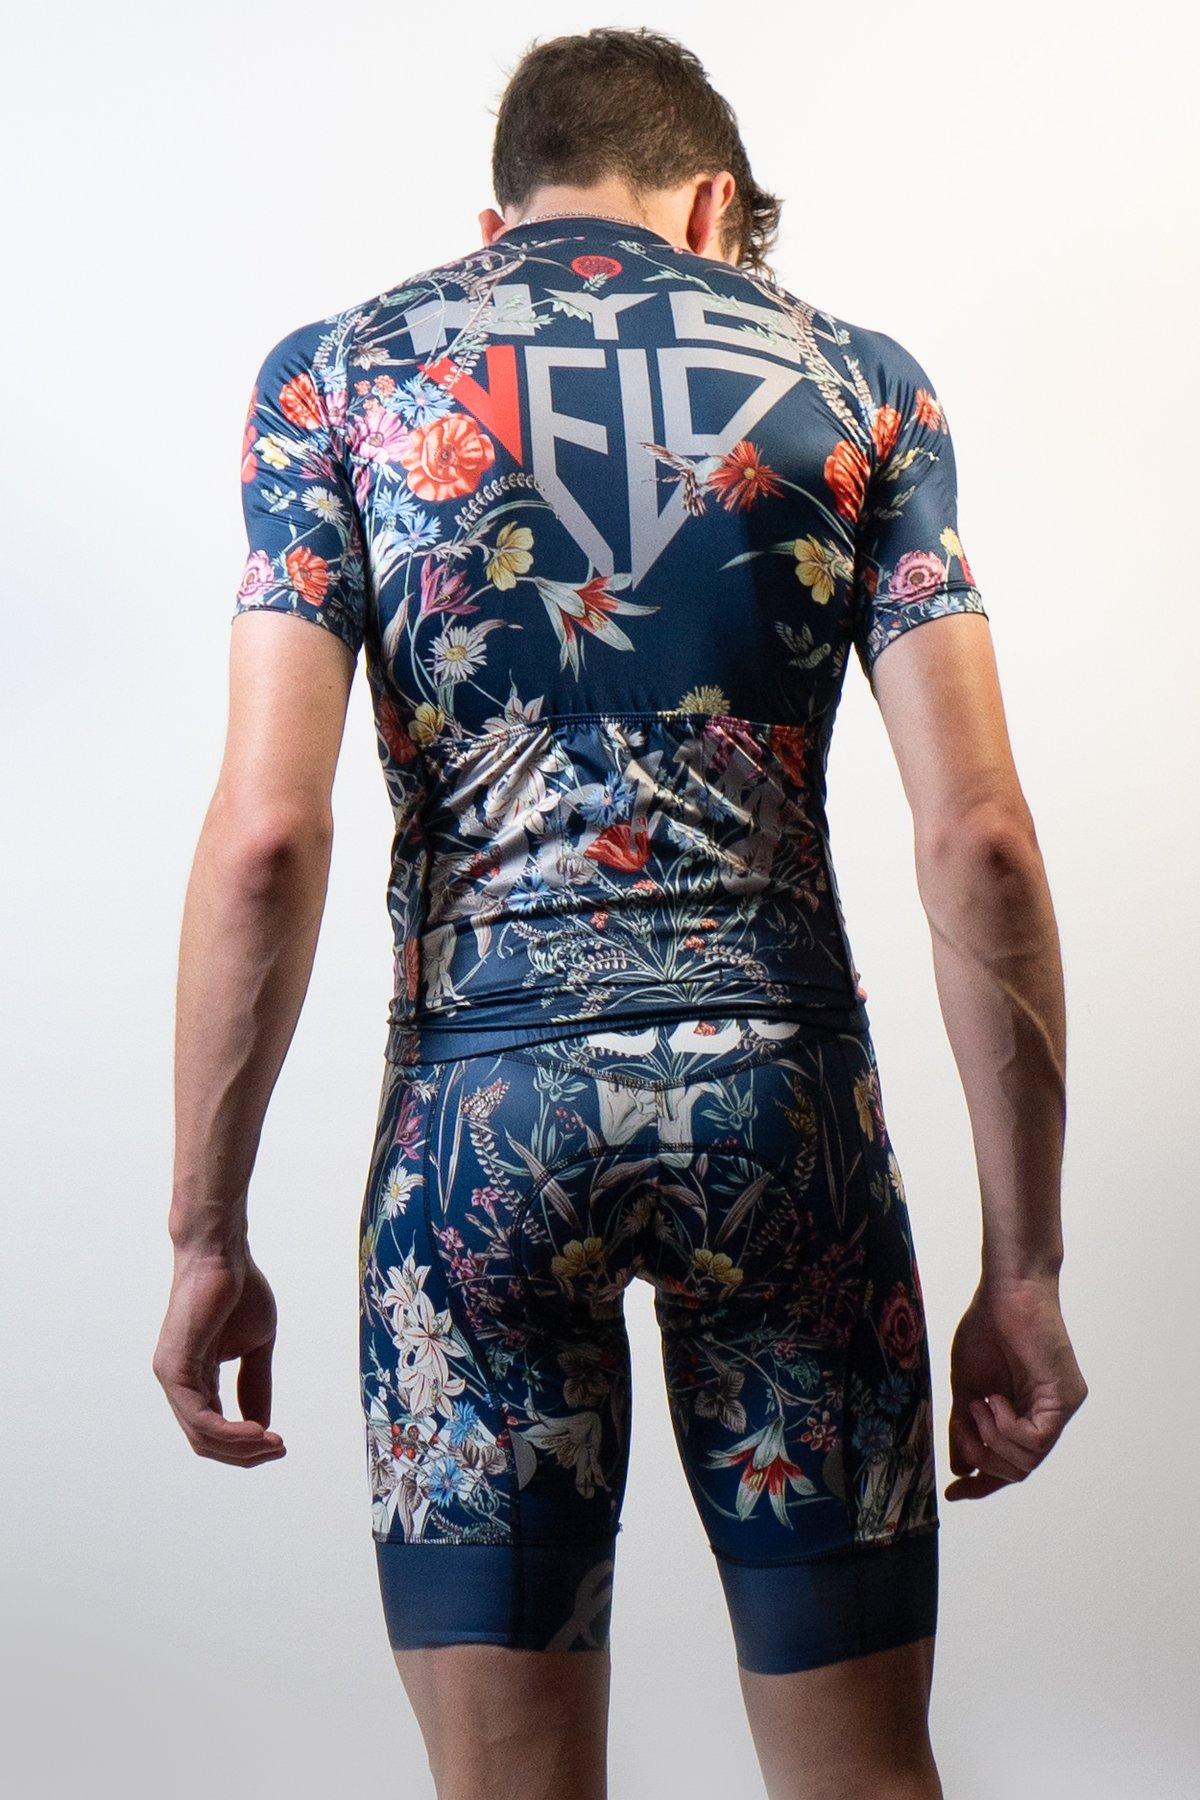 Men's Floral Bib & Jersey Bundle